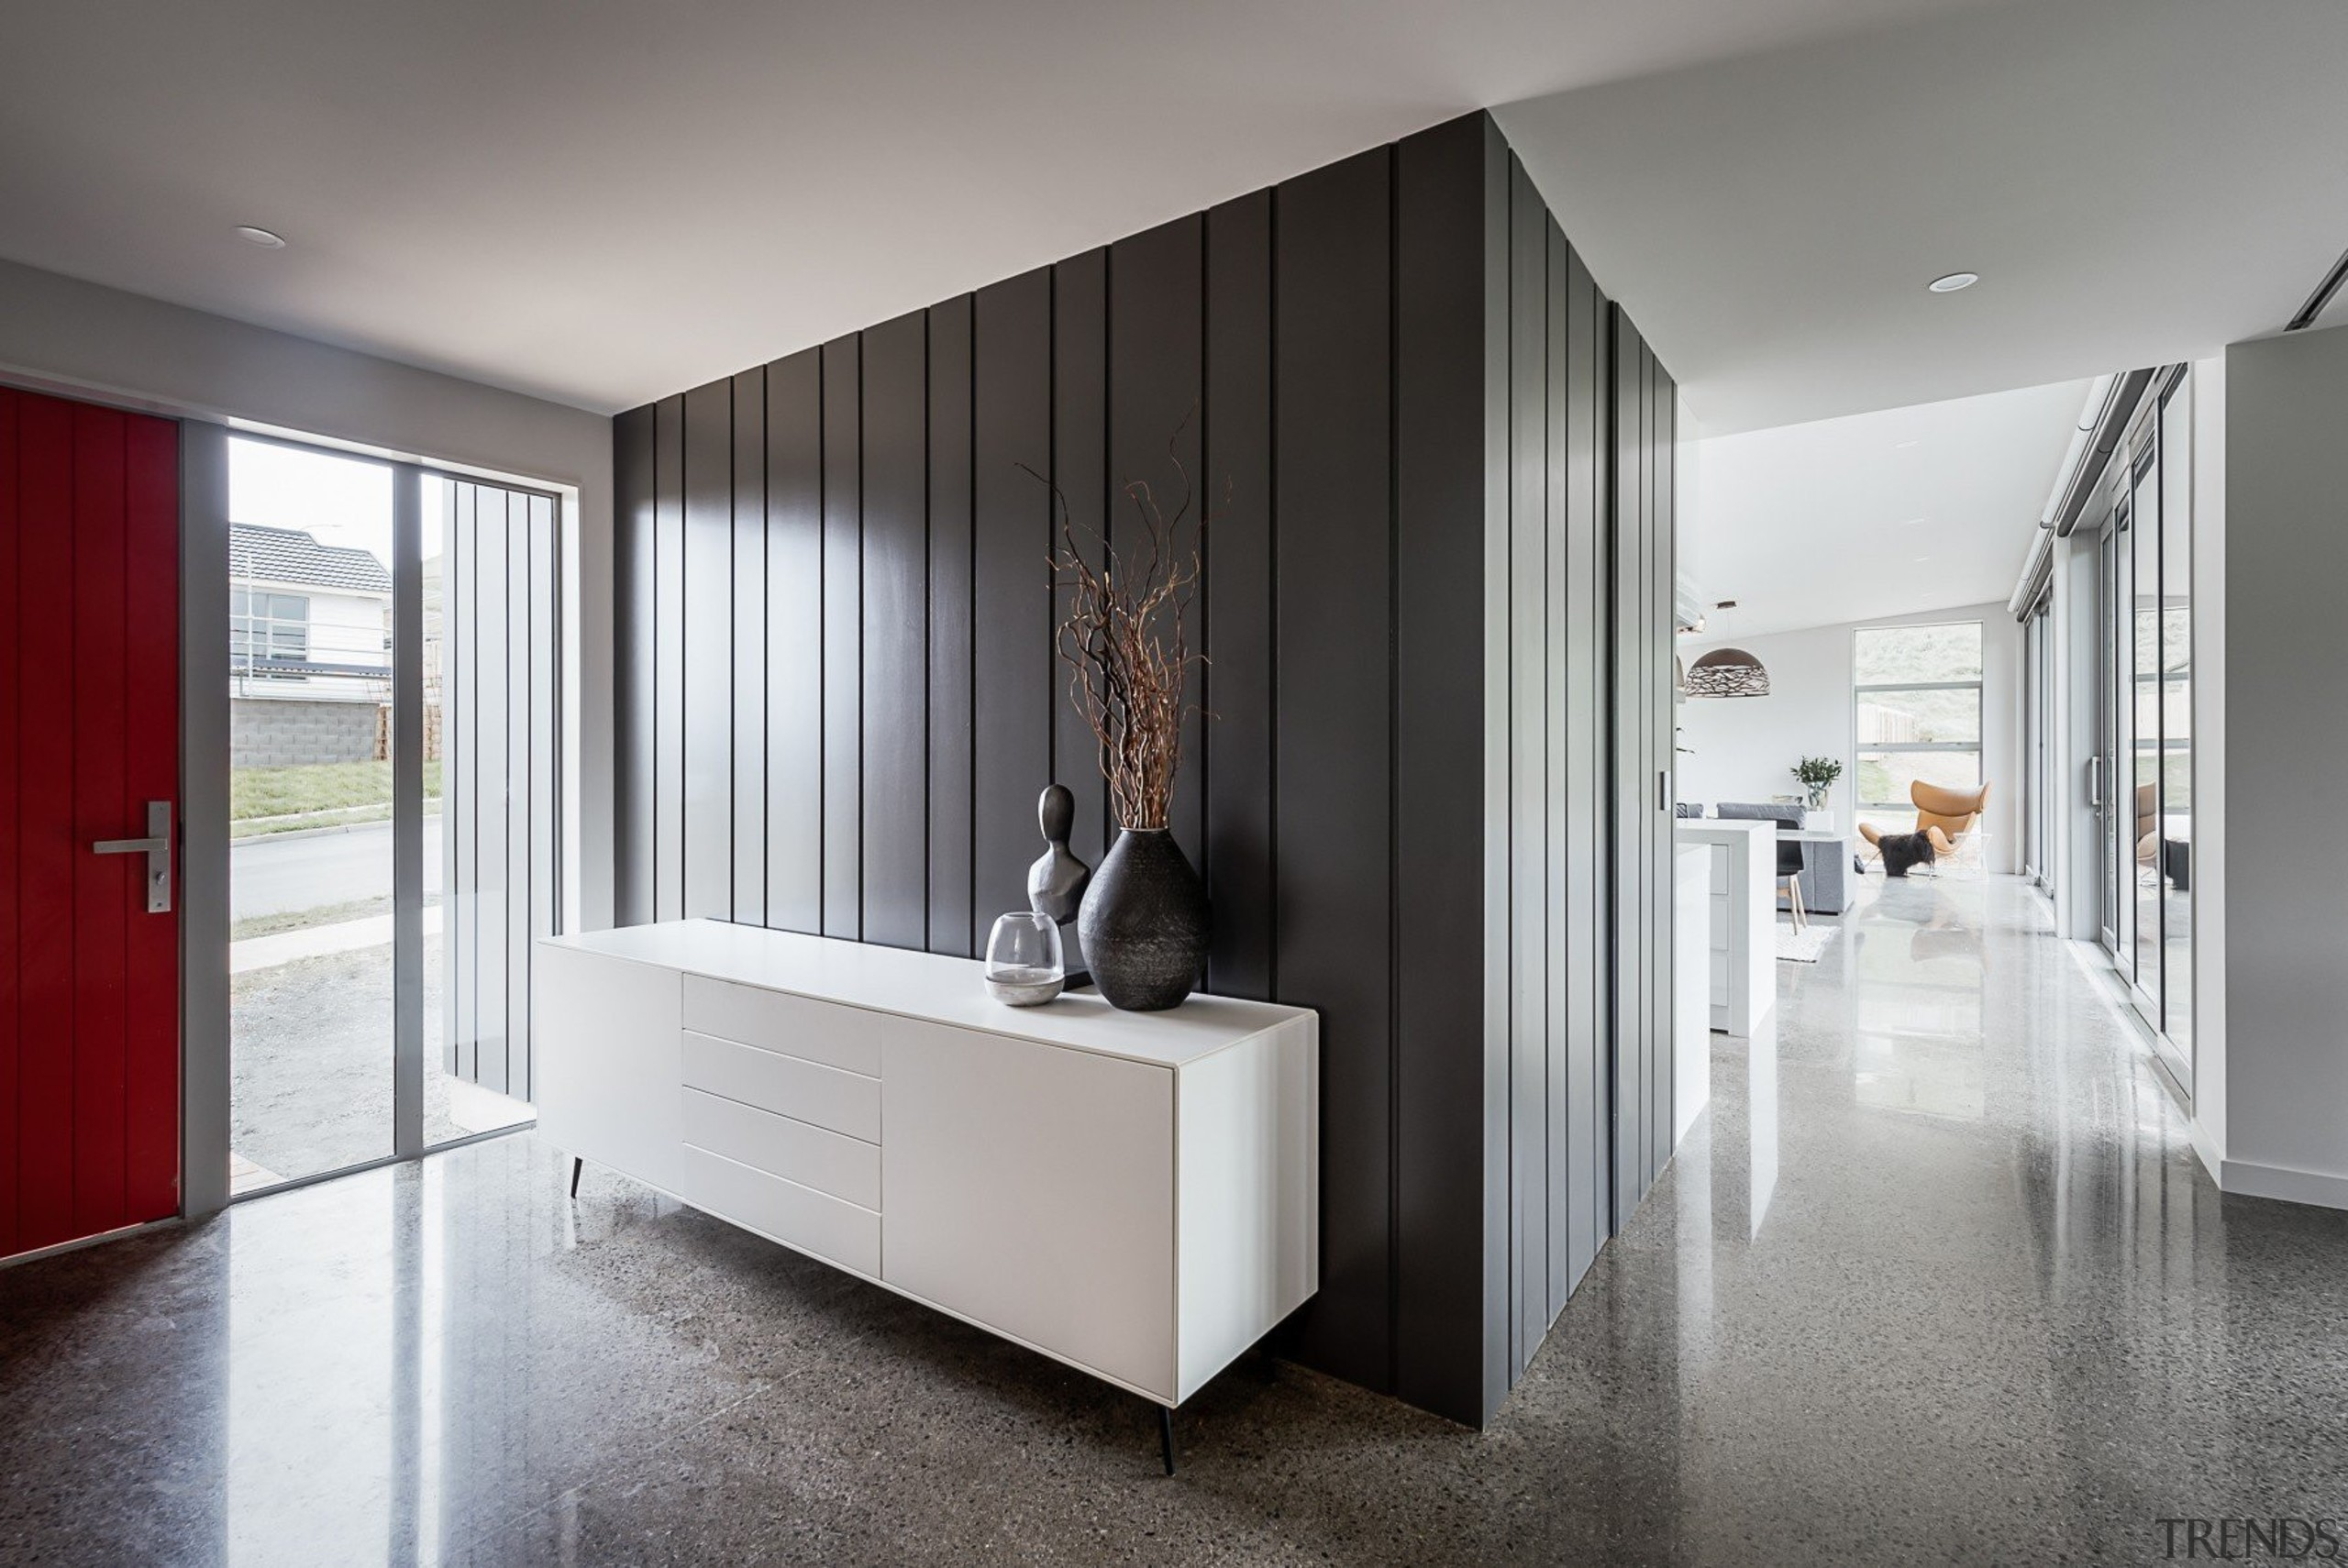 Linea Oblique Weatherboard - Linea Oblique Weatherboard - ceiling, floor, flooring, furniture, interior design, gray